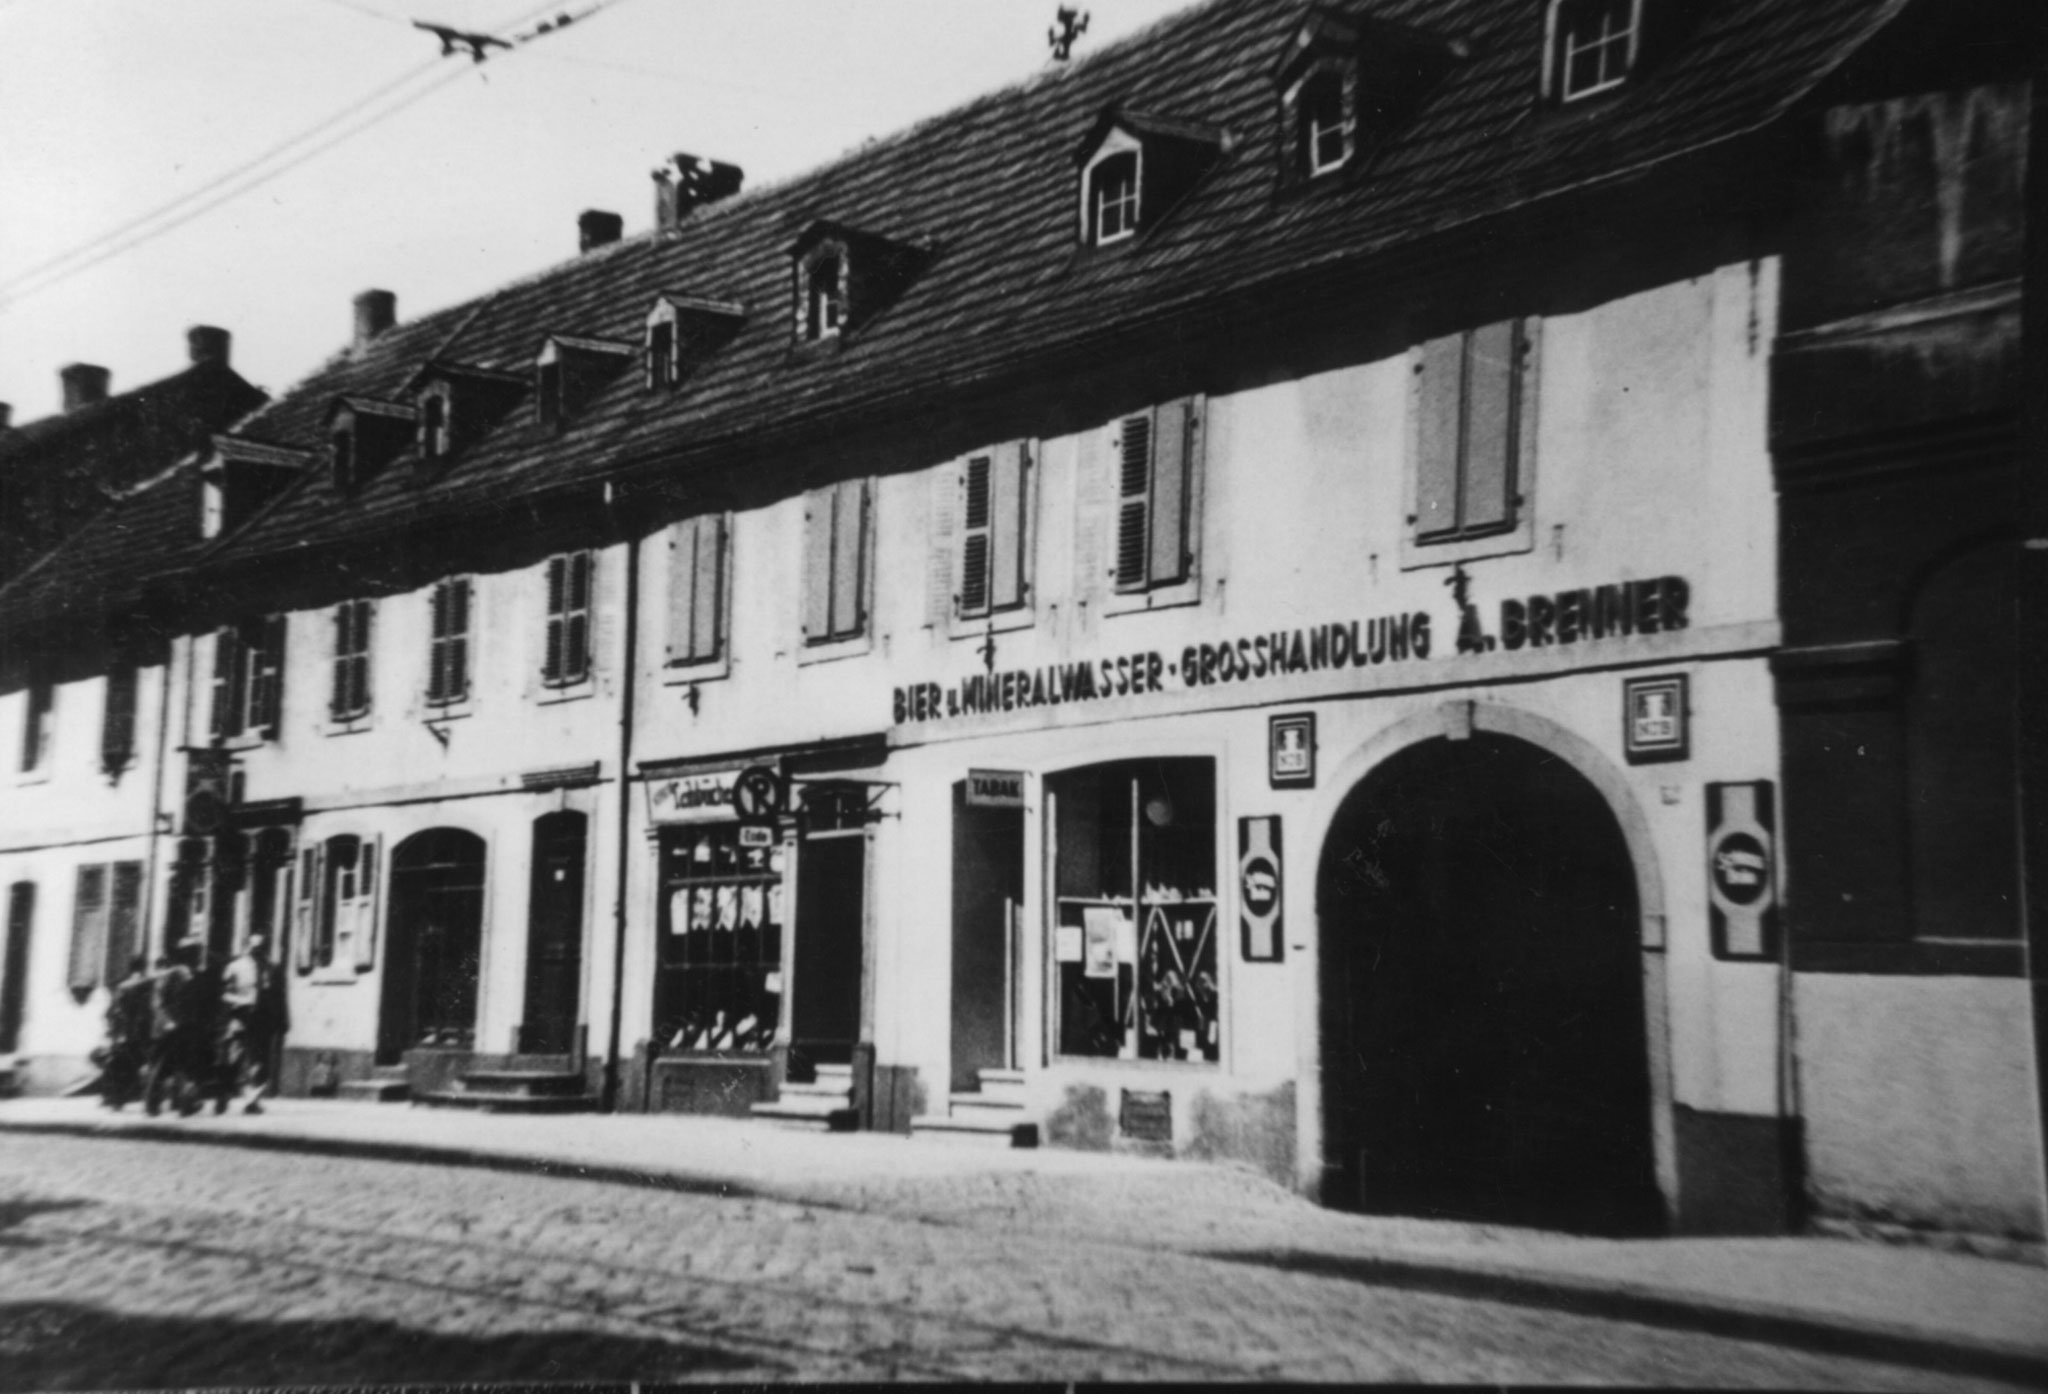 Getränkevertrieb Brenner 1930